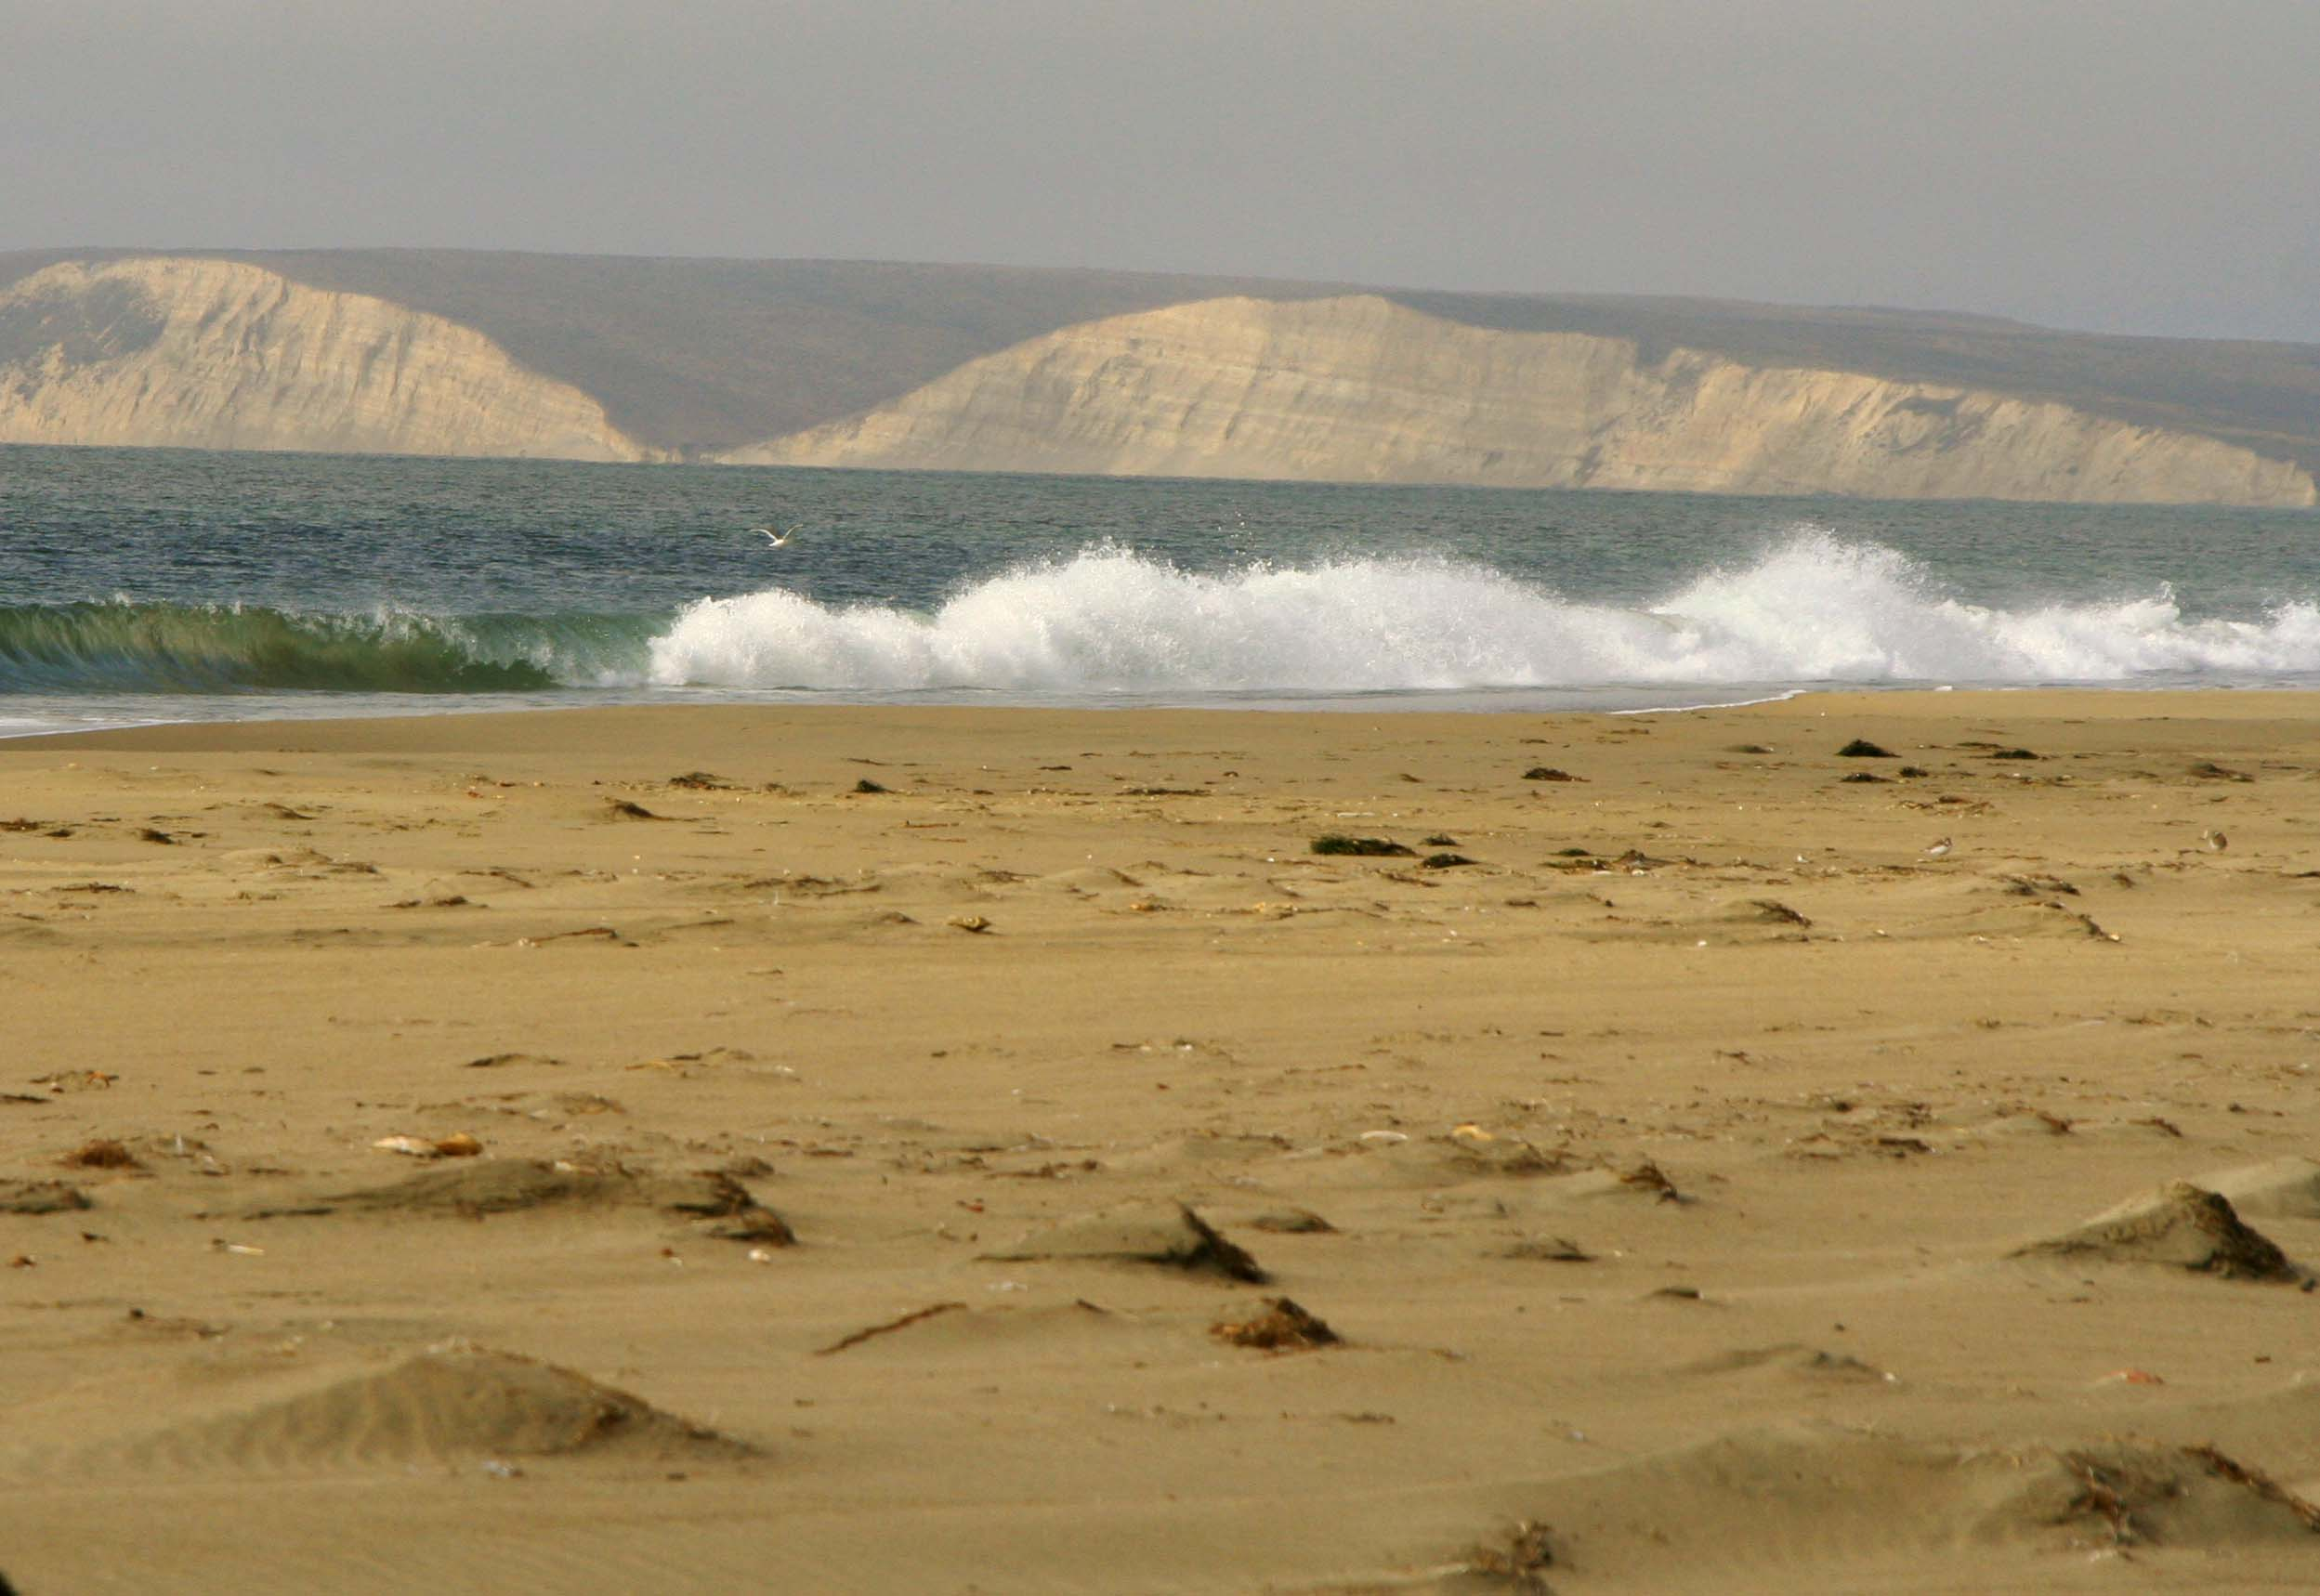 Limantour Beach at Pt. Reyes National Seashore.